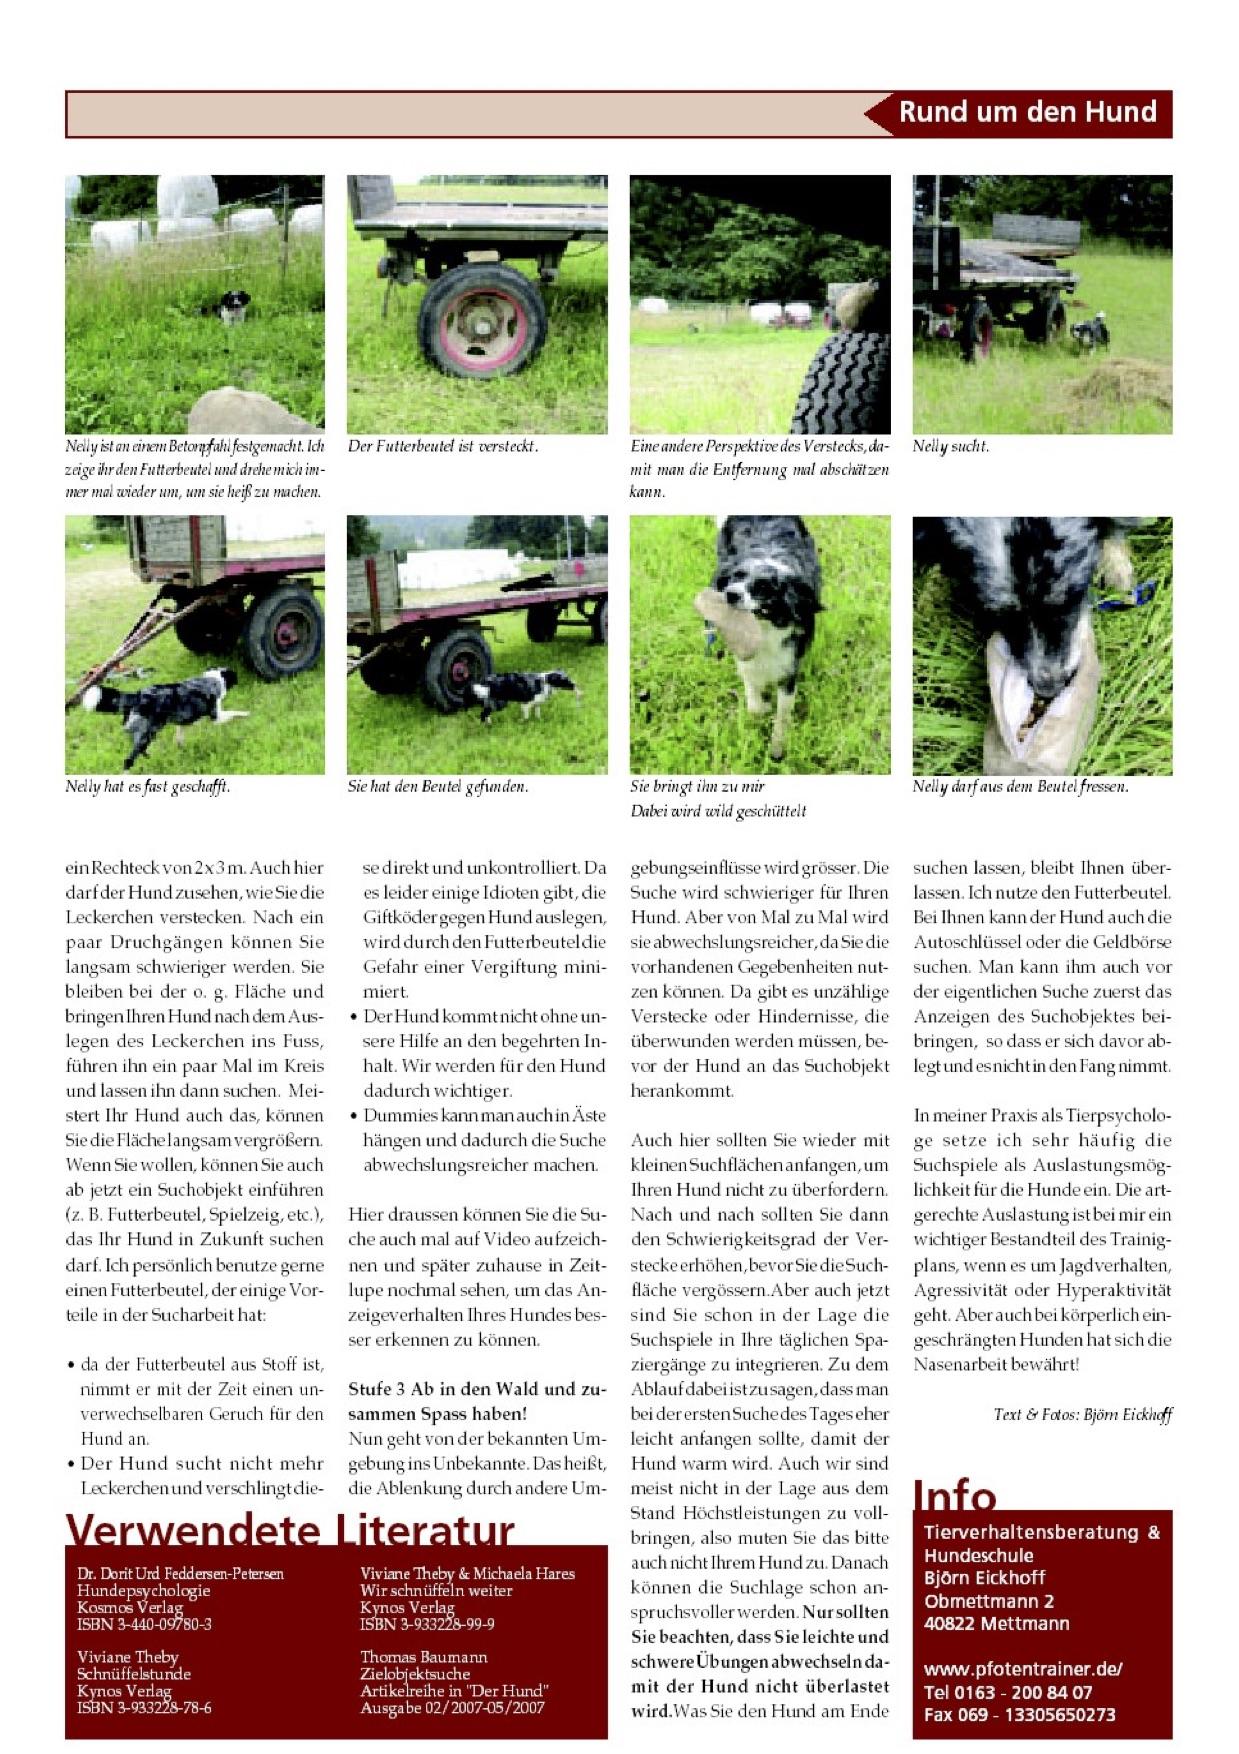 Artikel_Nasenarbeit_2007_08